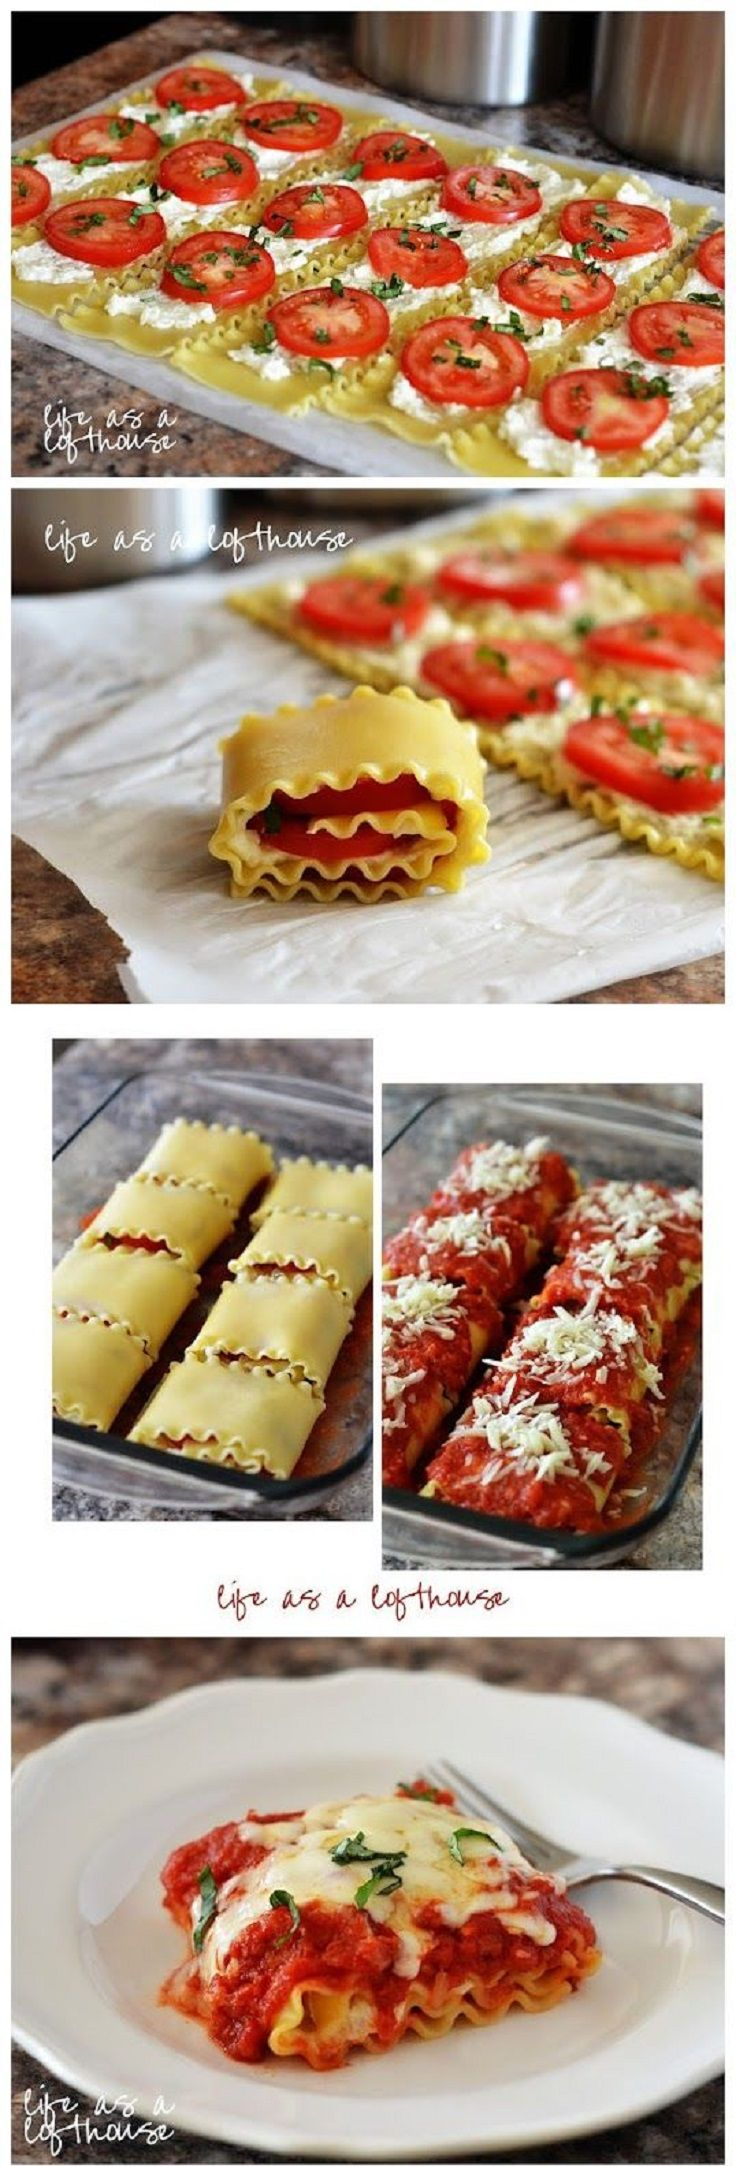 12 Top Rated Italian Recipes